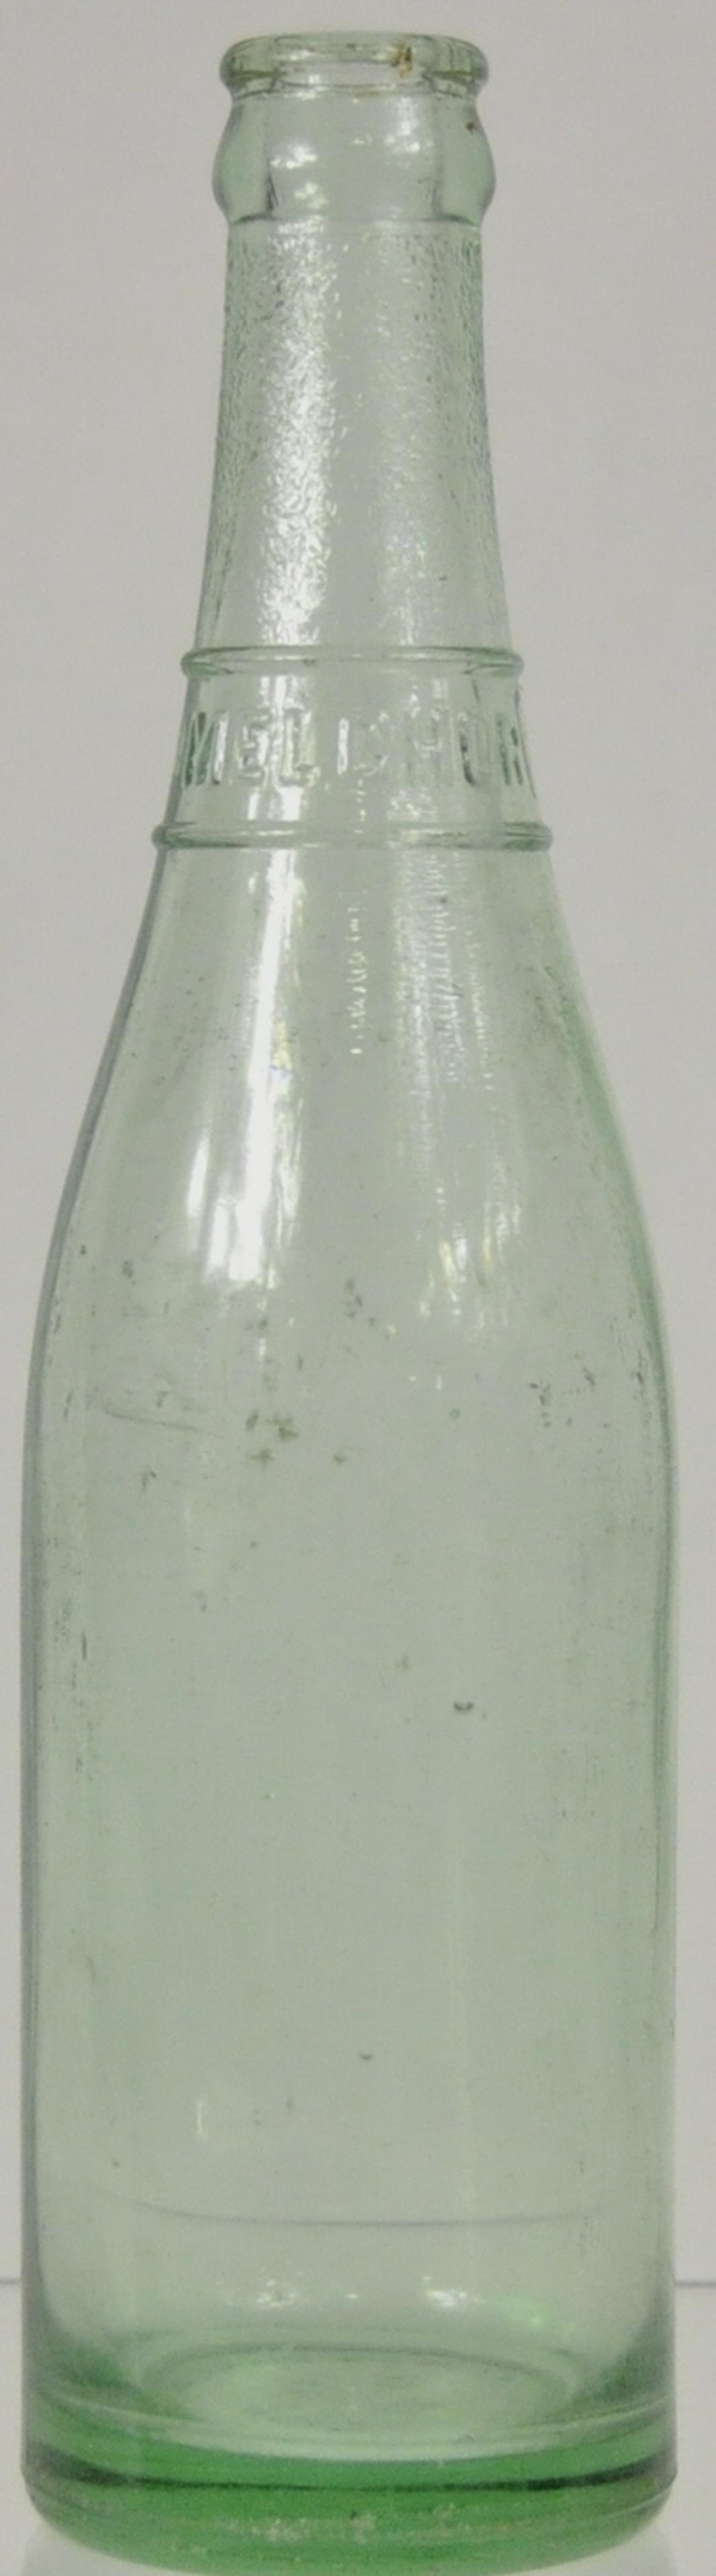 Melchor / Pepsi Cola / Orange Crush Bottle